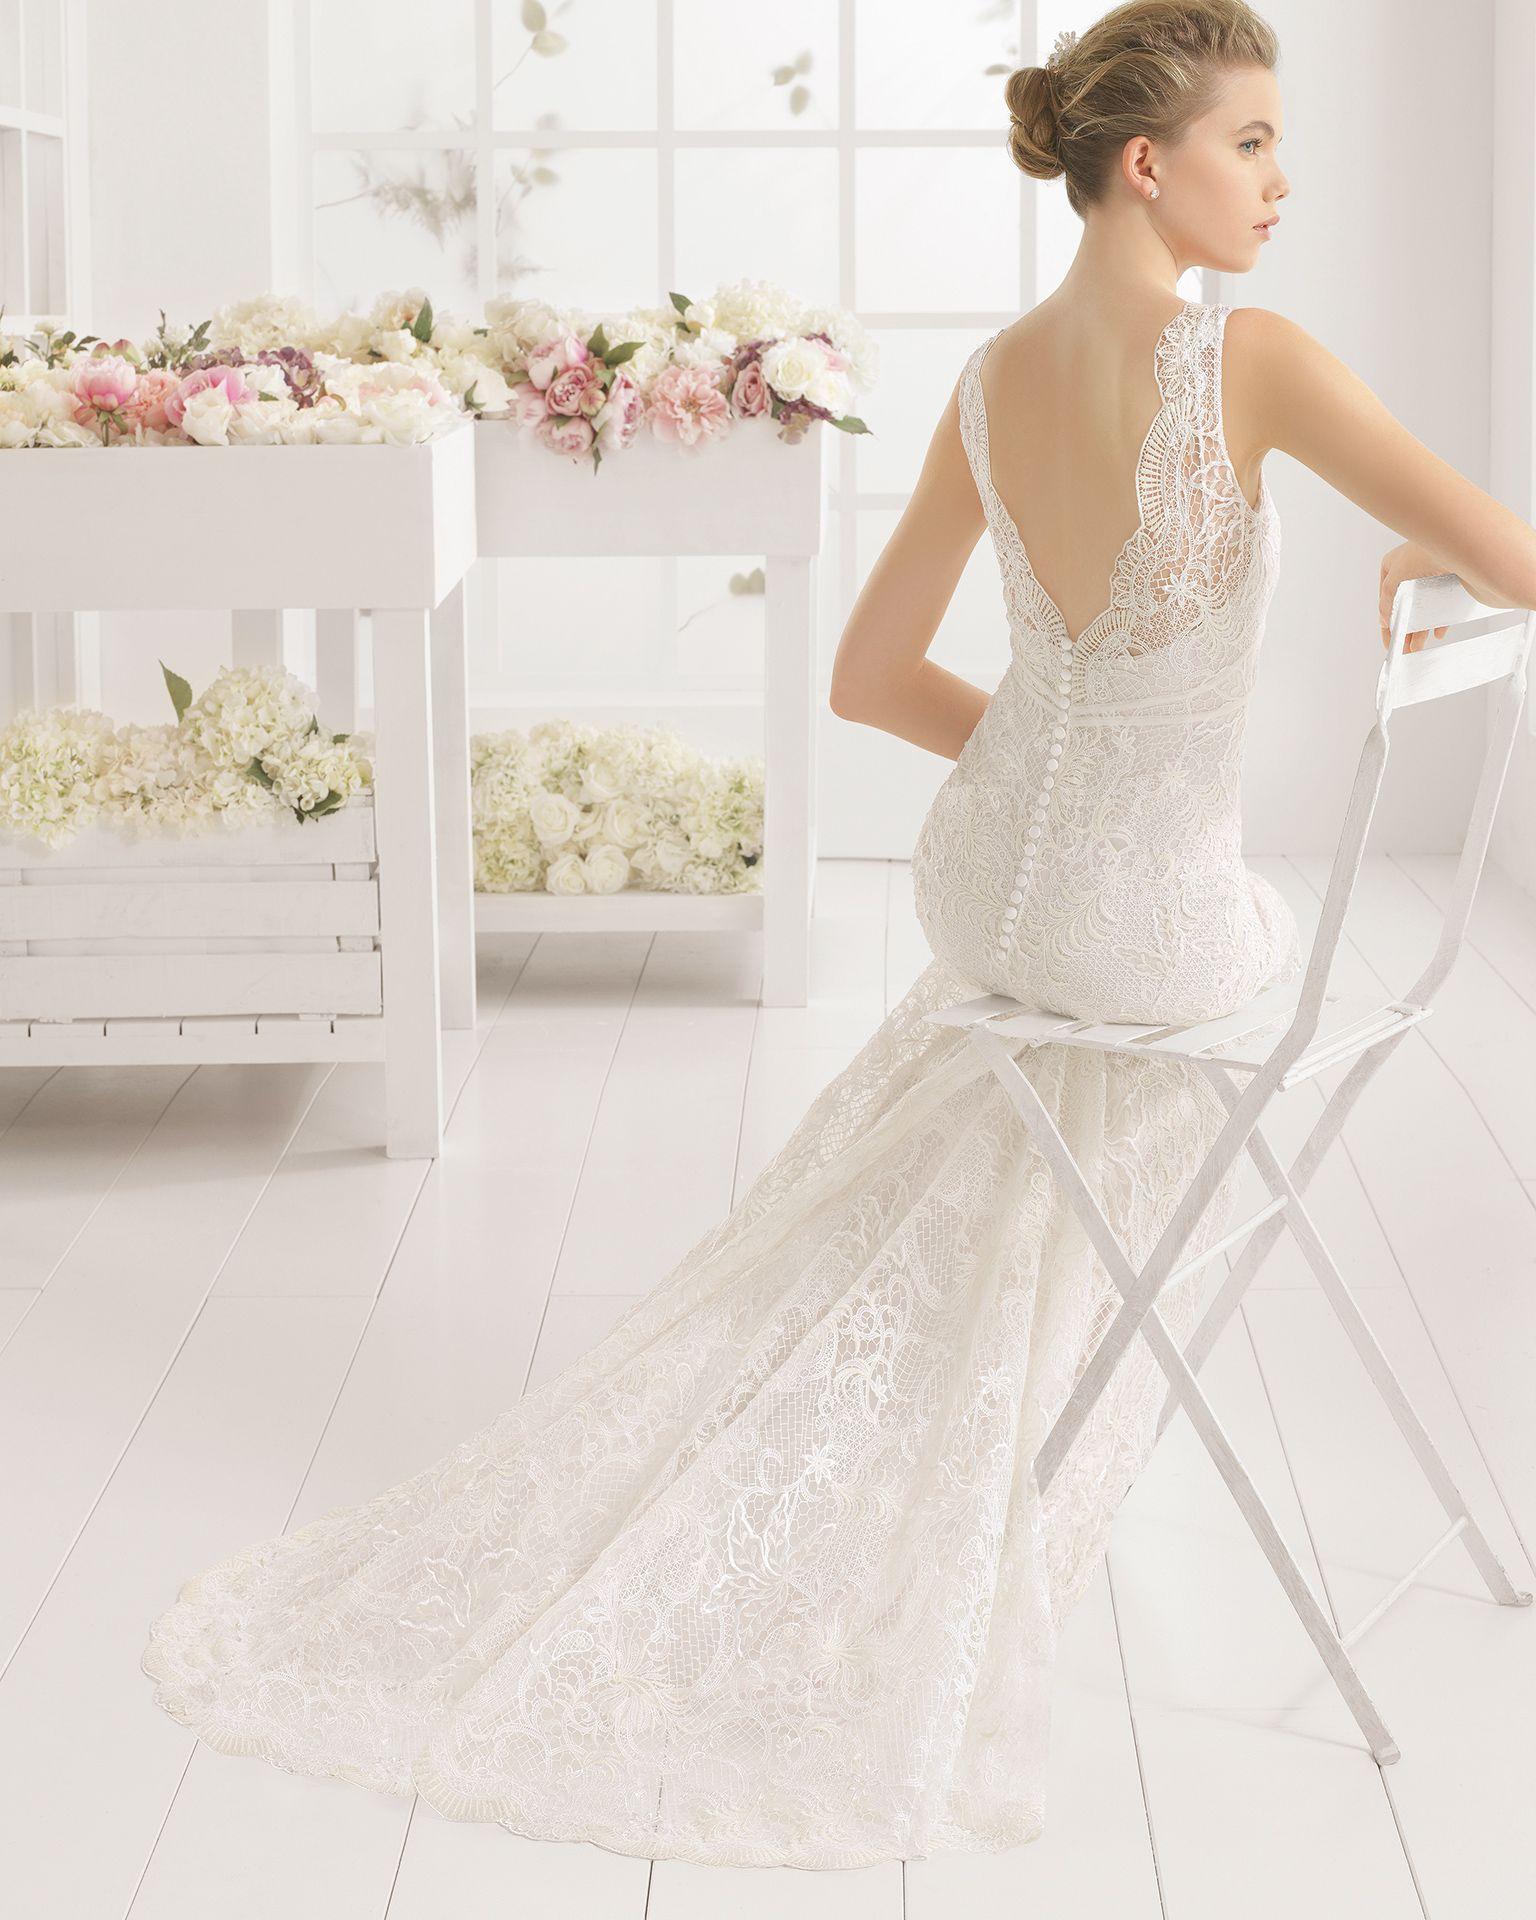 MALTA vestido de novia en guipour. | One Day | Pinterest | Aire ...